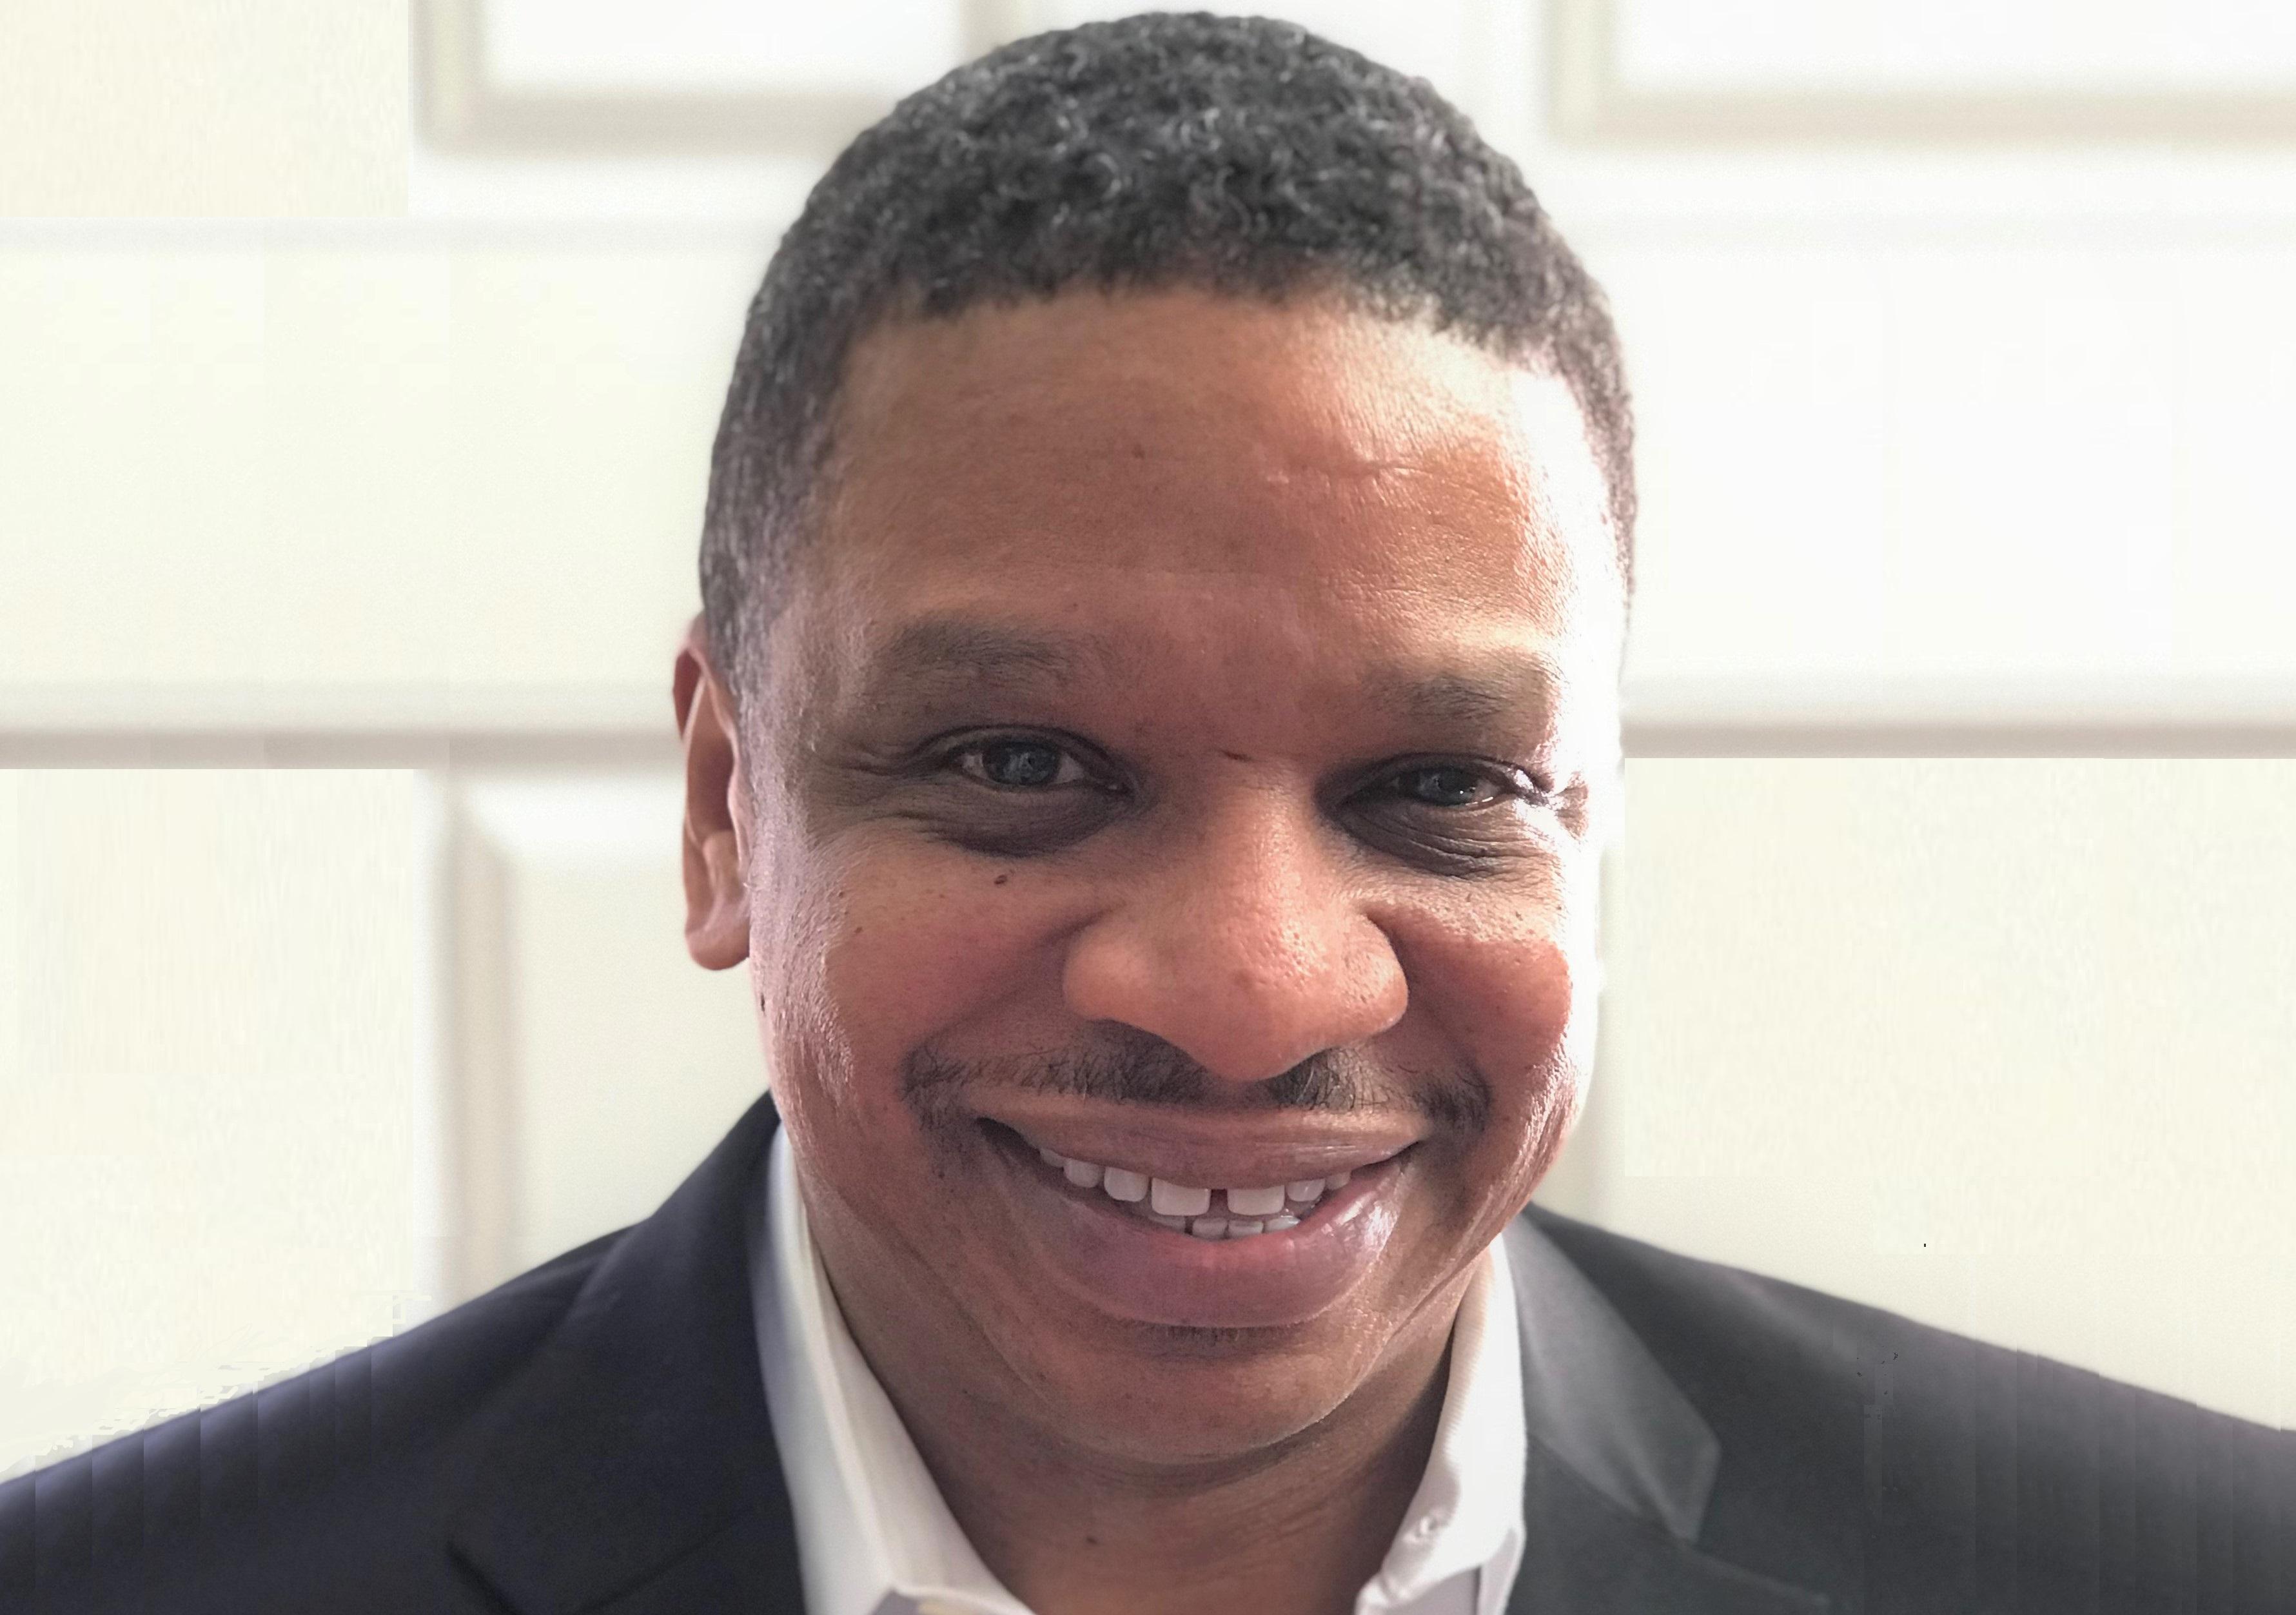 https://itsupplychain.com/wp-content/uploads/2019/03/Bobby-Miller-Senior-Director-Customer-Success-ToolsGroup-900-x-633.jpg